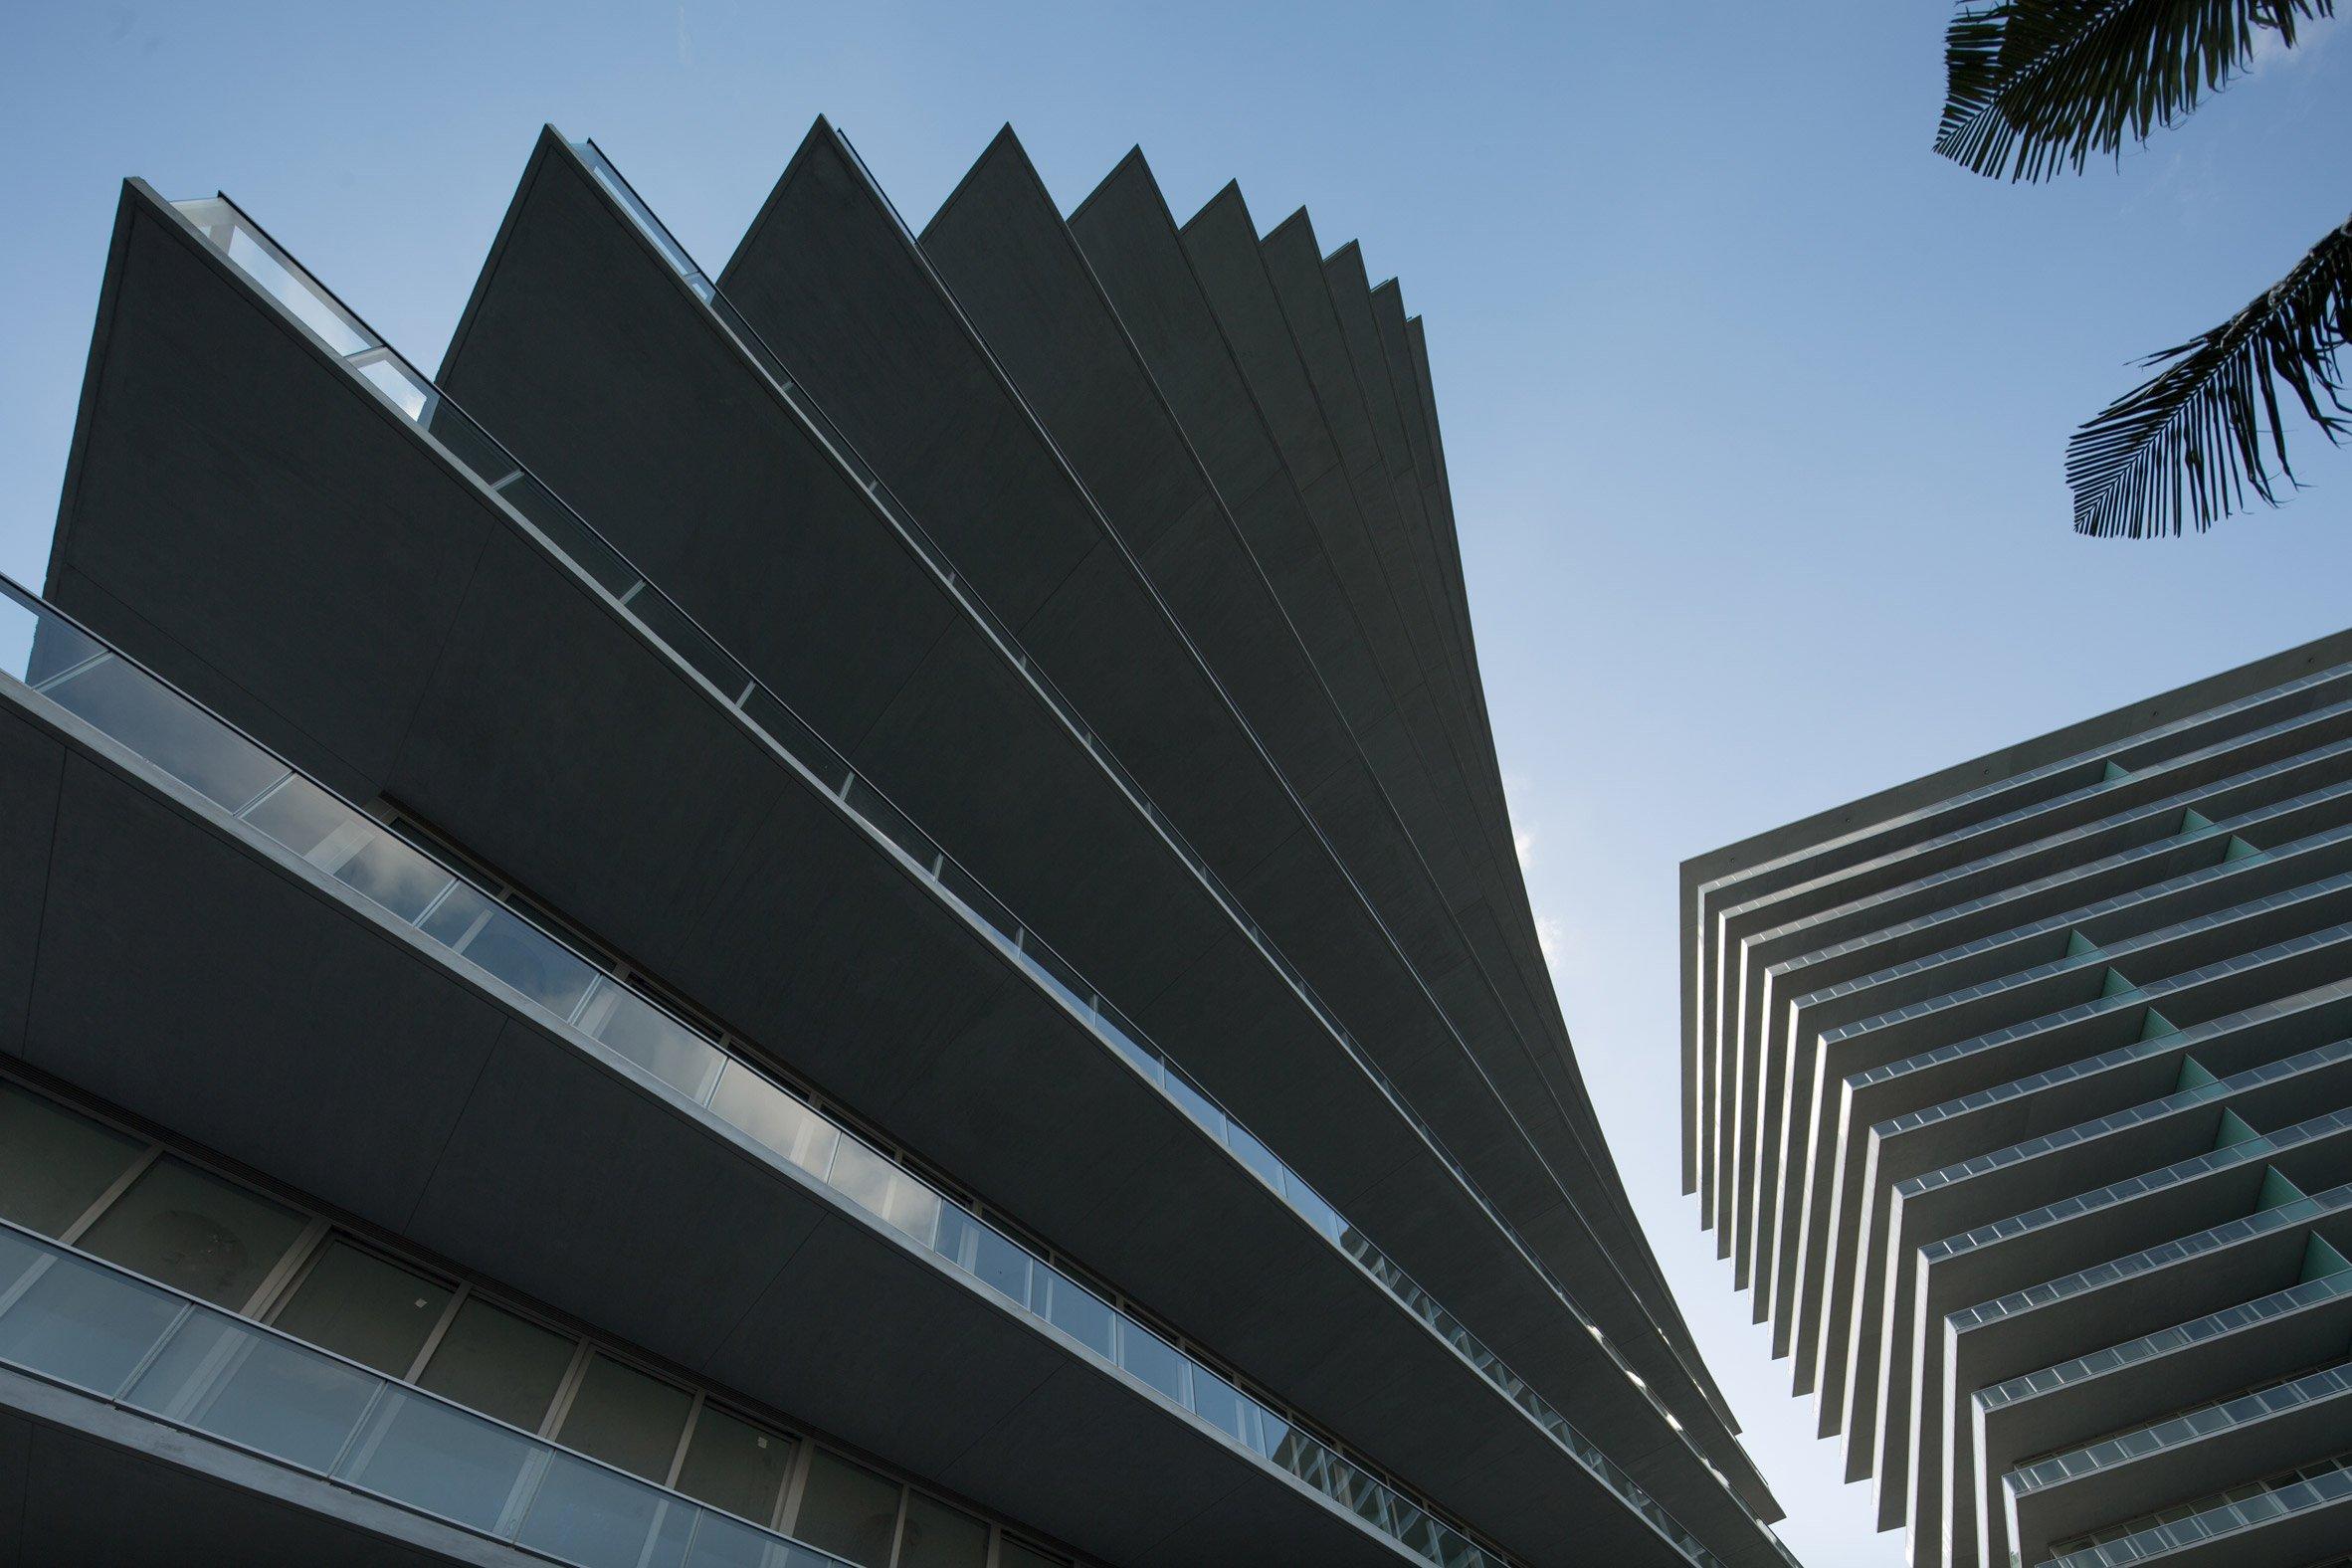 twisting-towers-by-bjarke-ingels-architecture-nyc_dezeen_2364_col_6